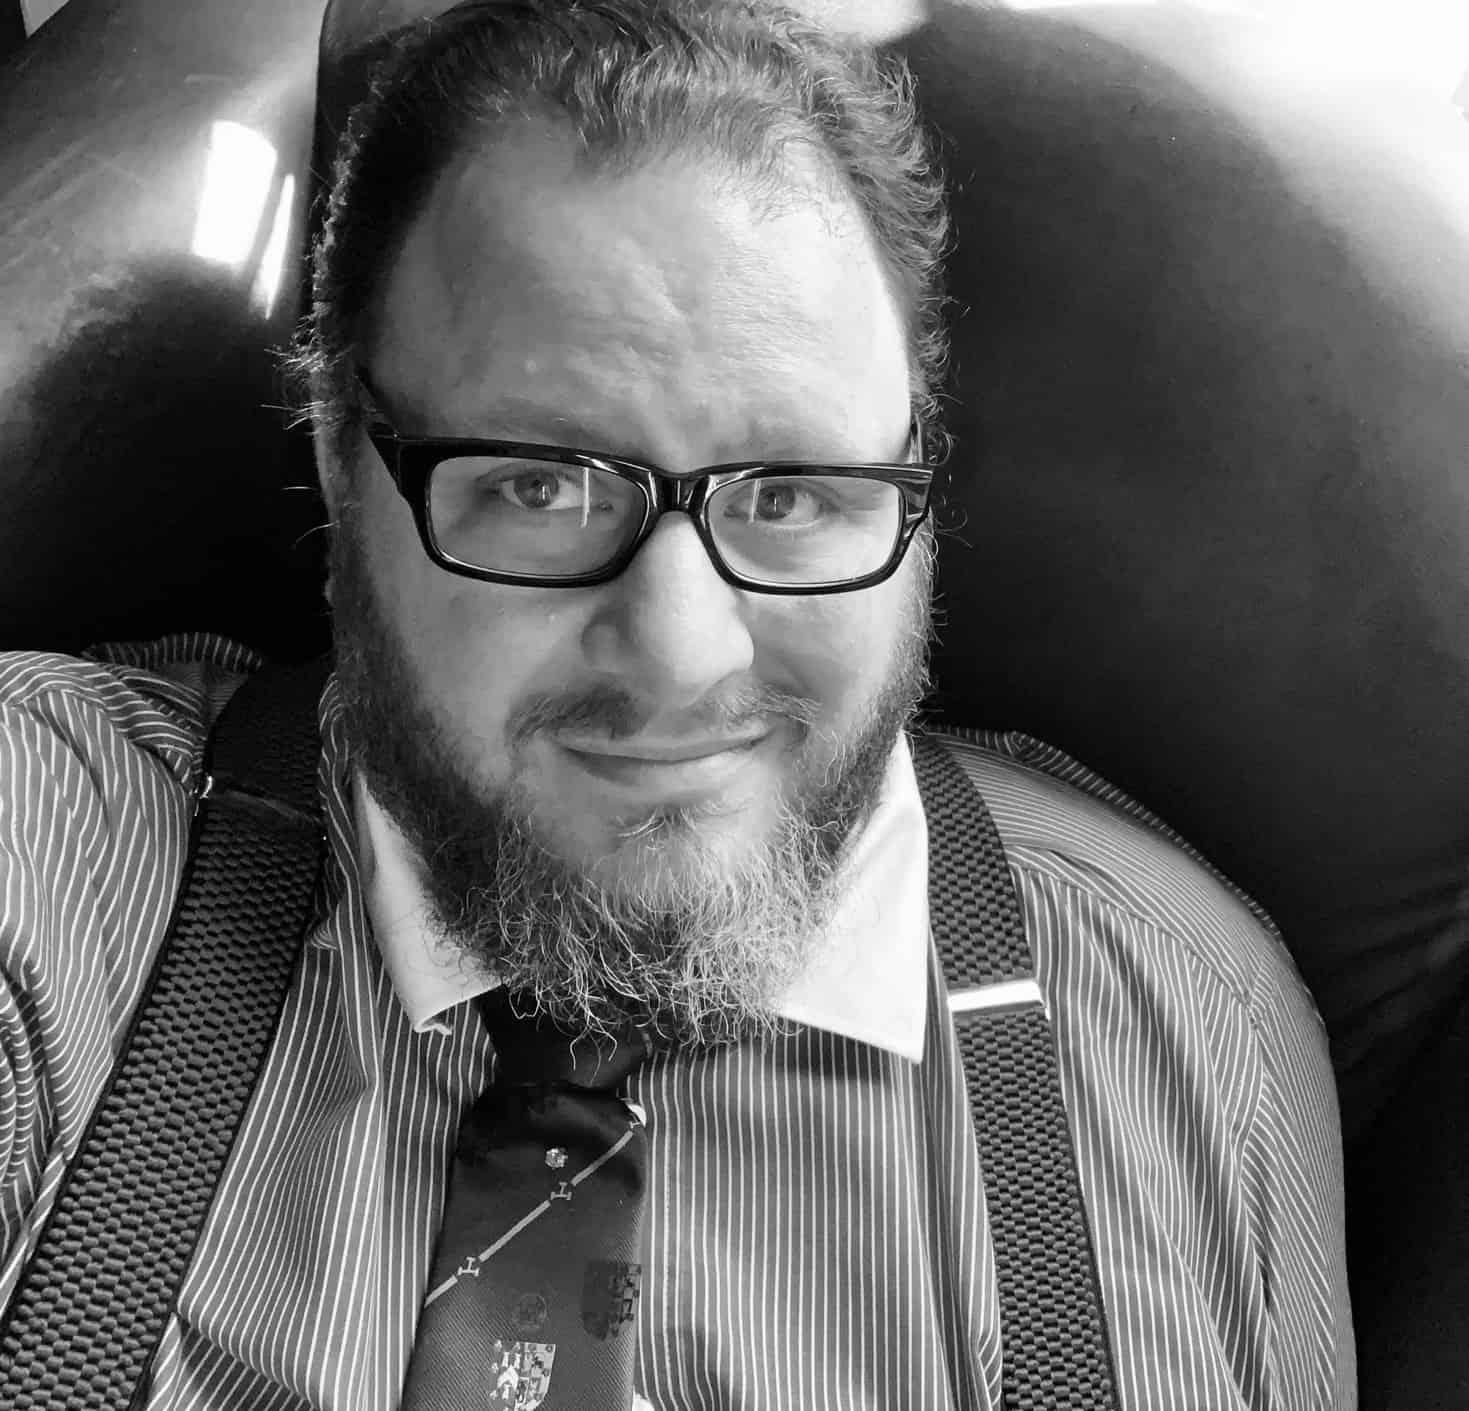 Shaun Brookhouse, International Speaker and Presenter